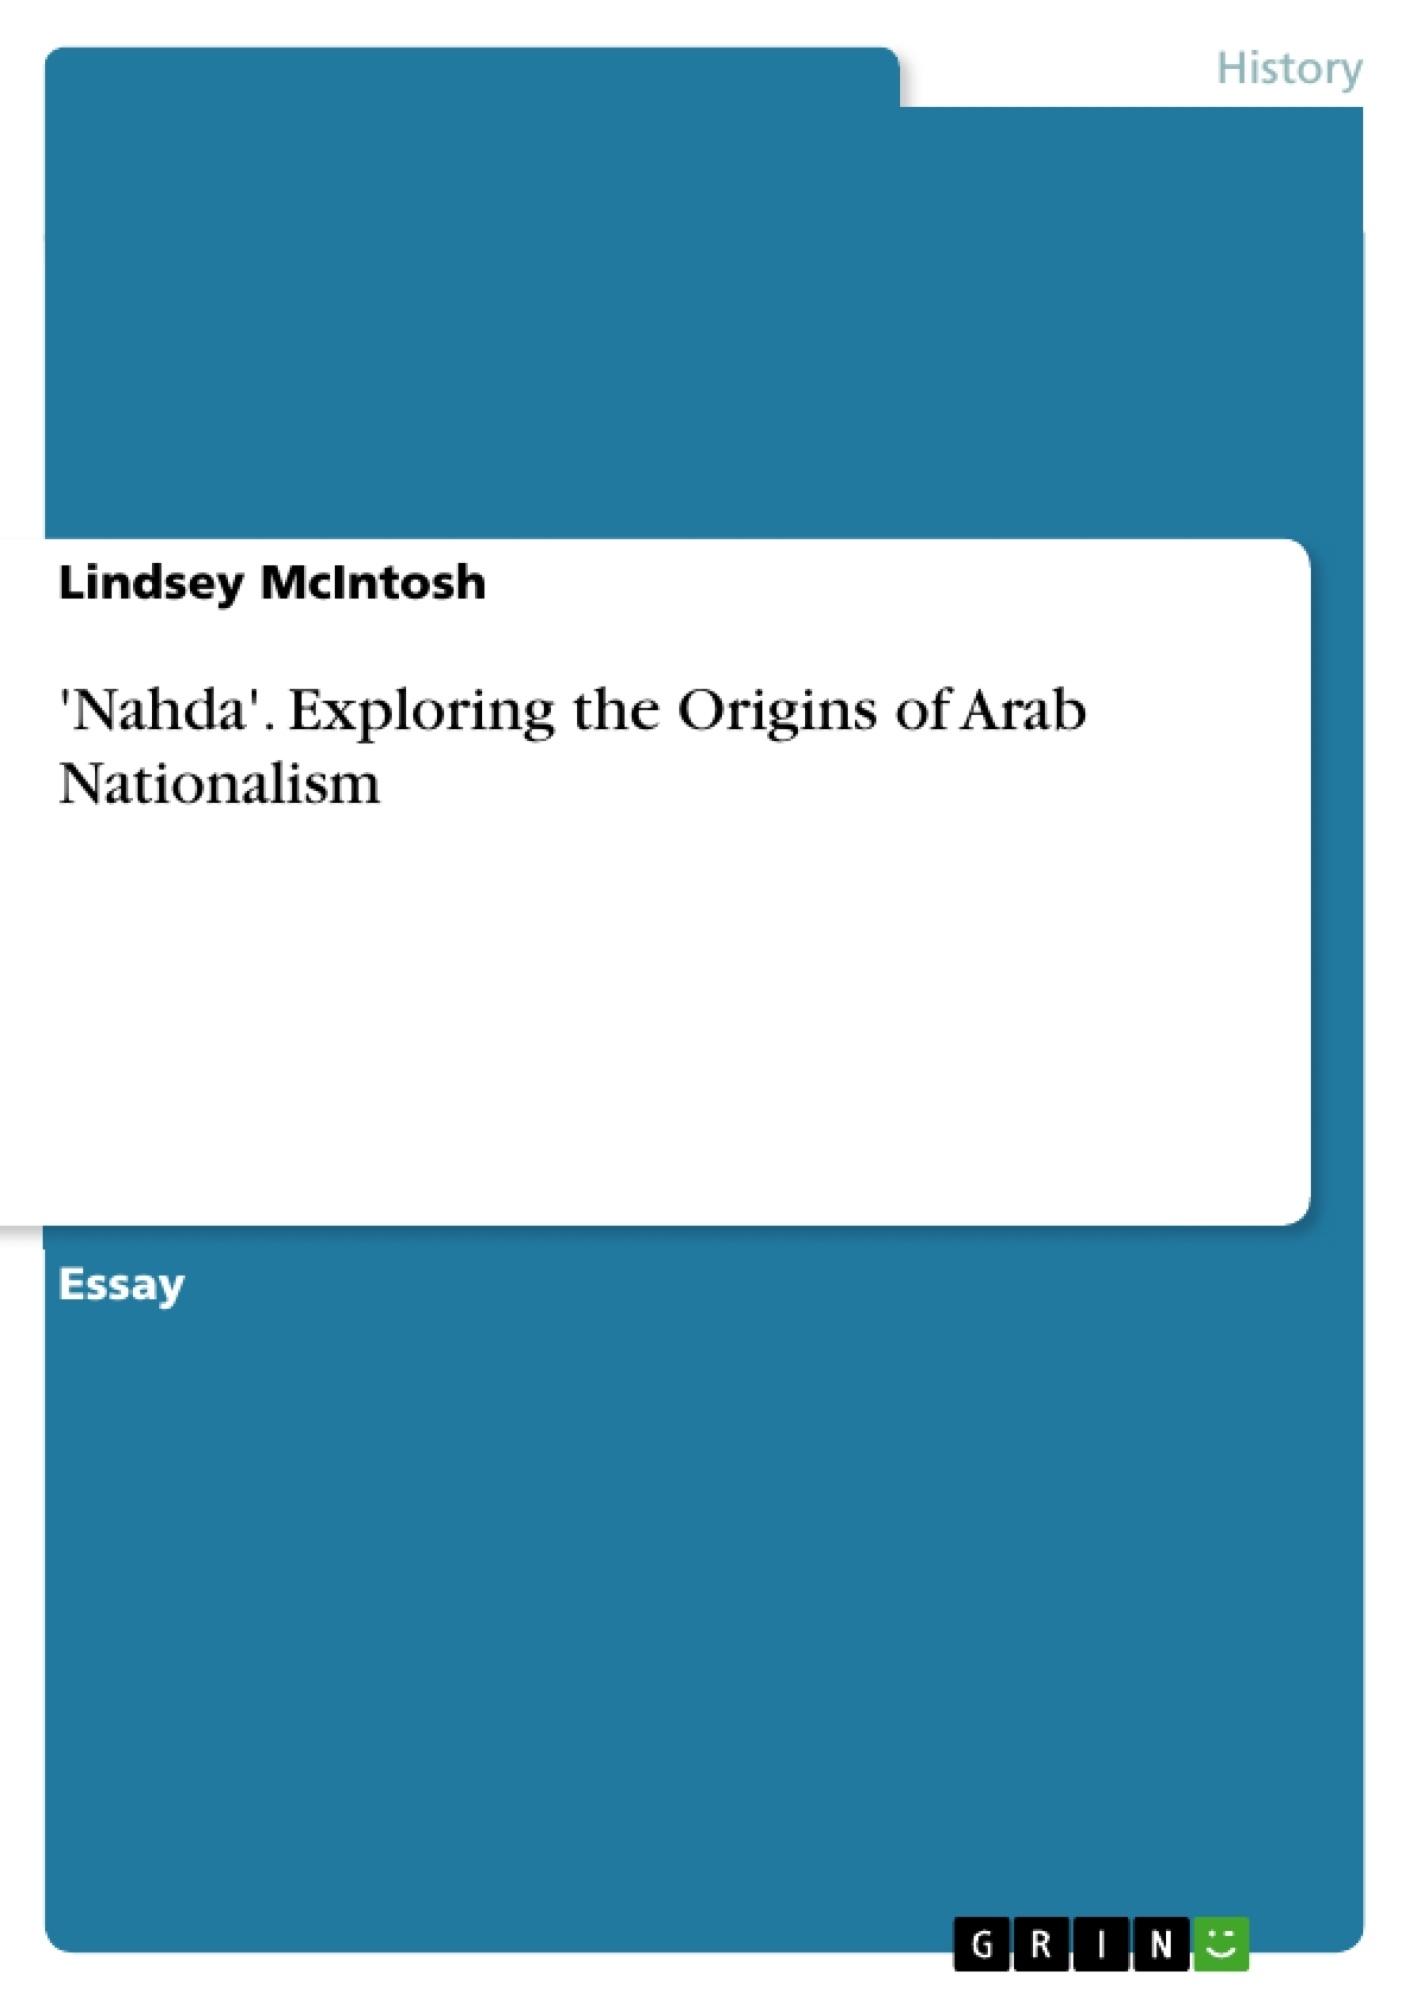 Title: 'Nahda'. Exploring the Origins of Arab Nationalism